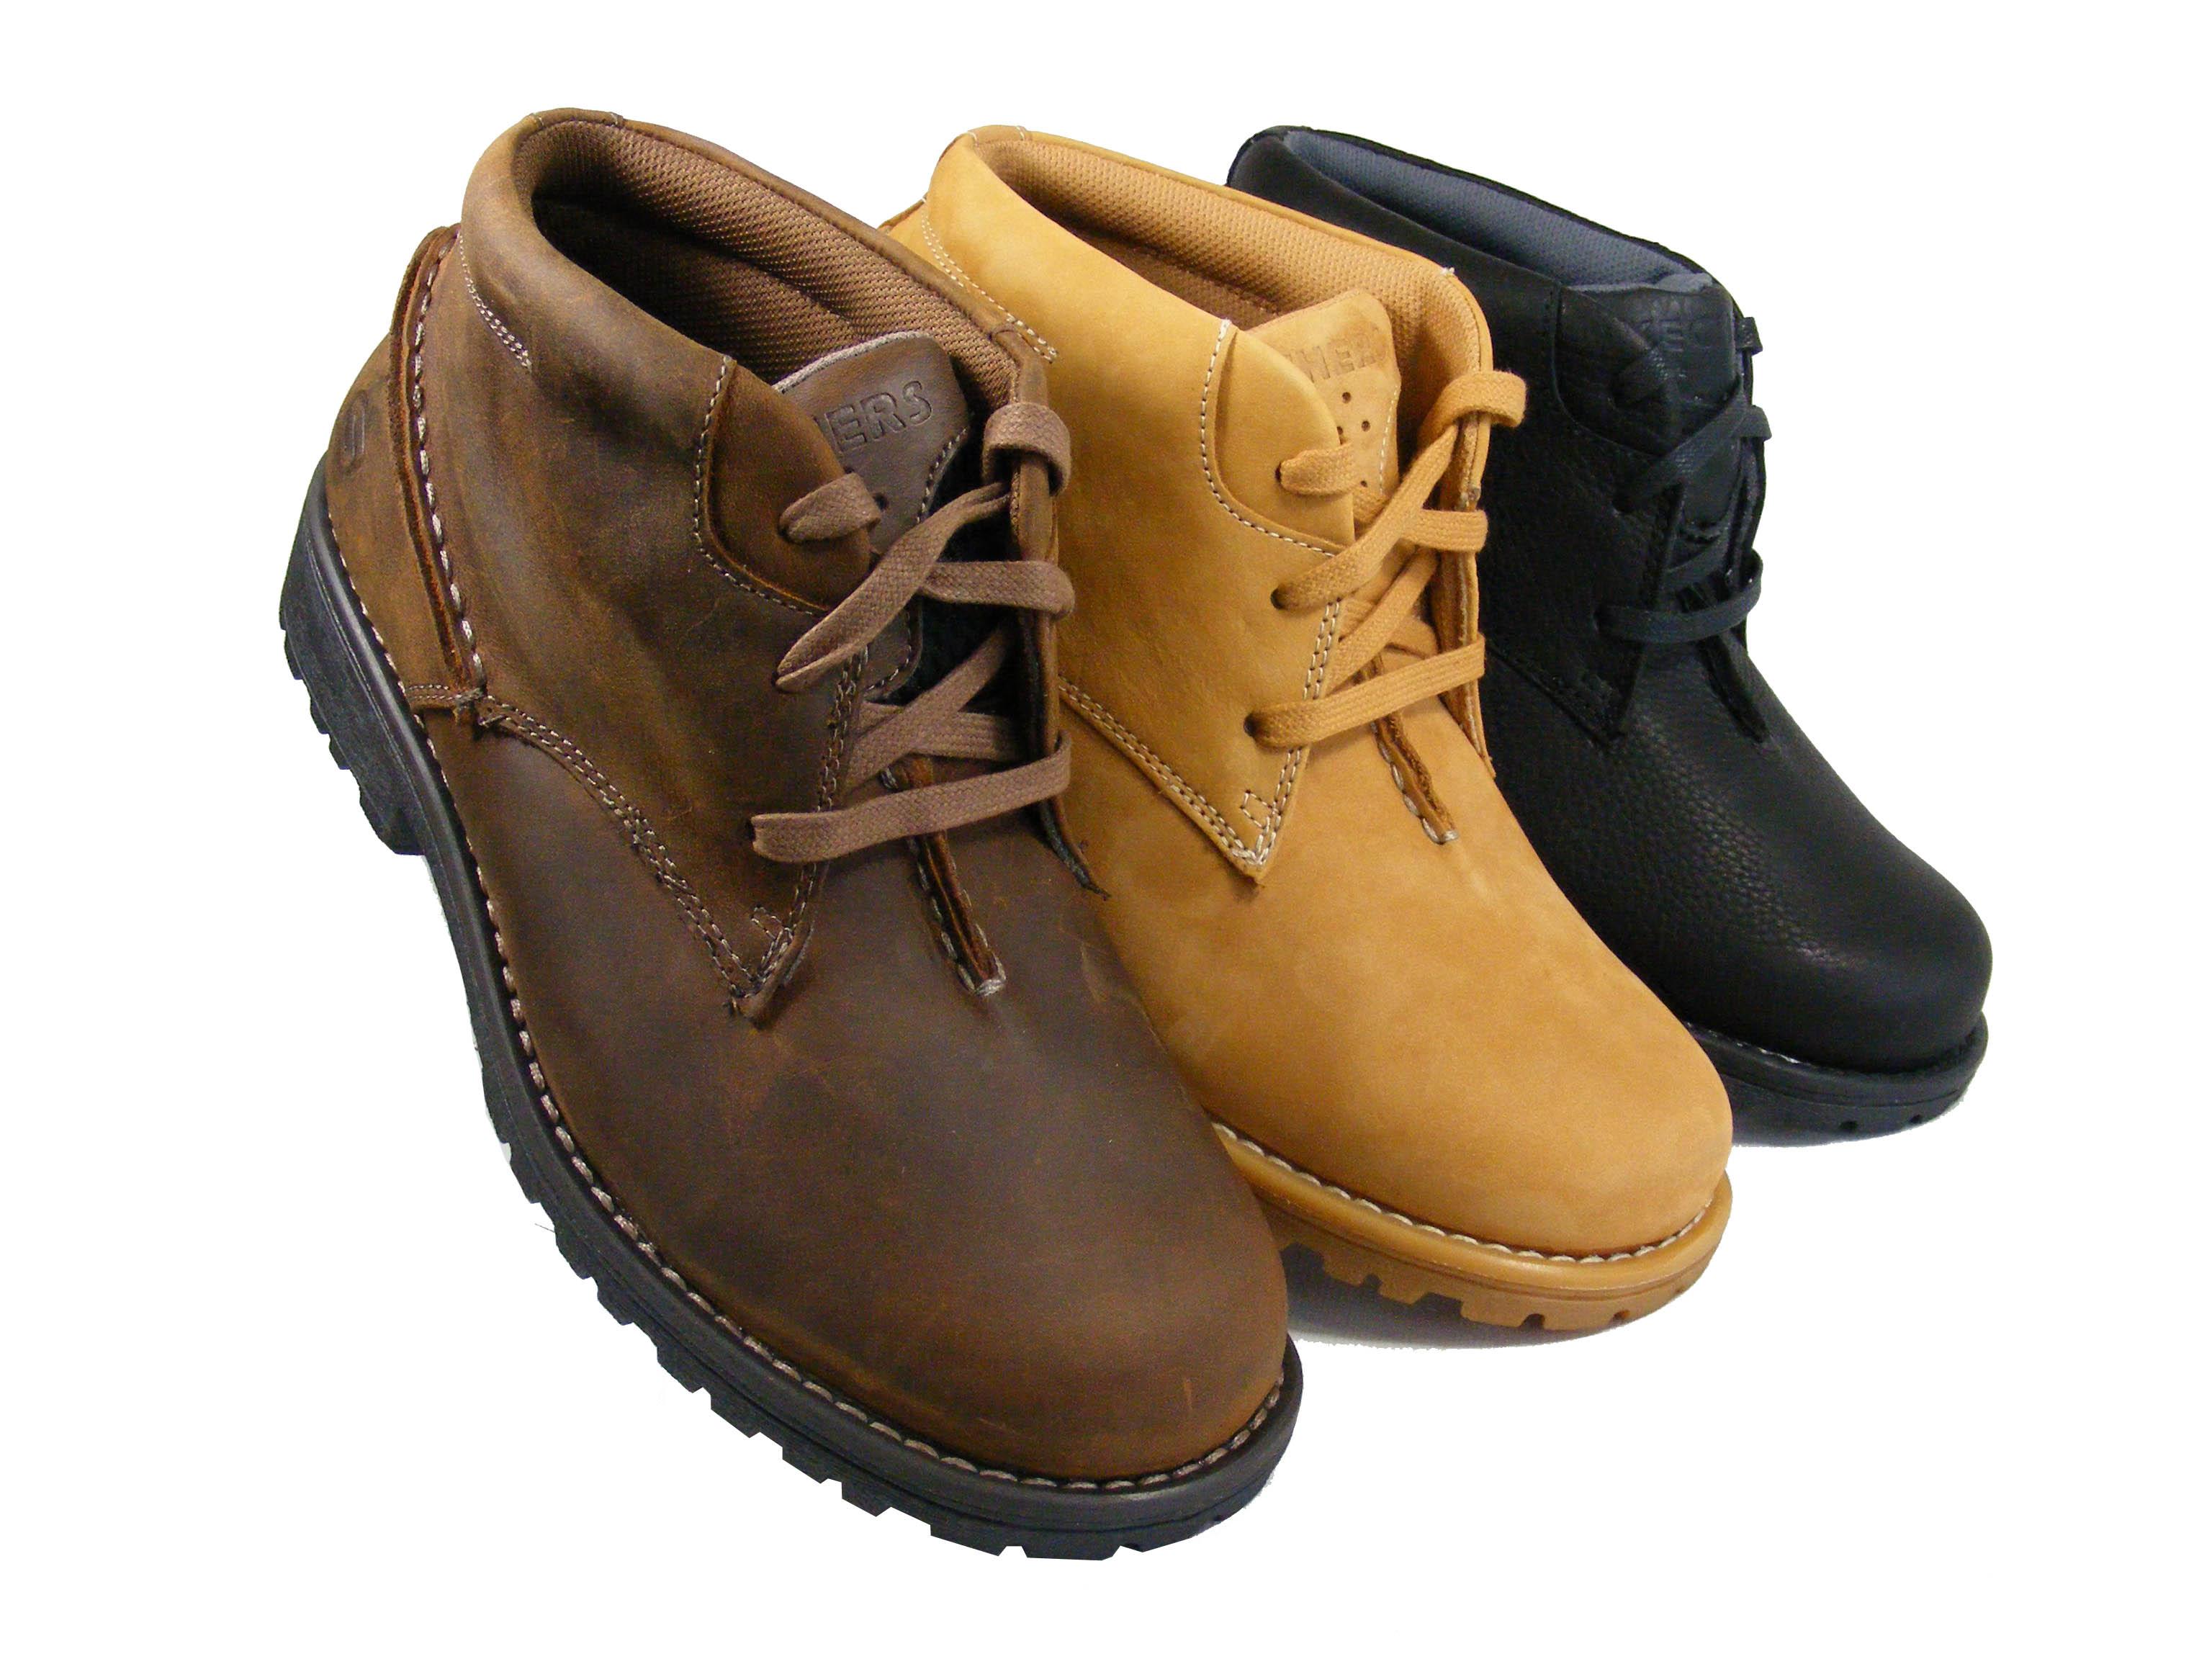 skechers hiking boots Sneakers